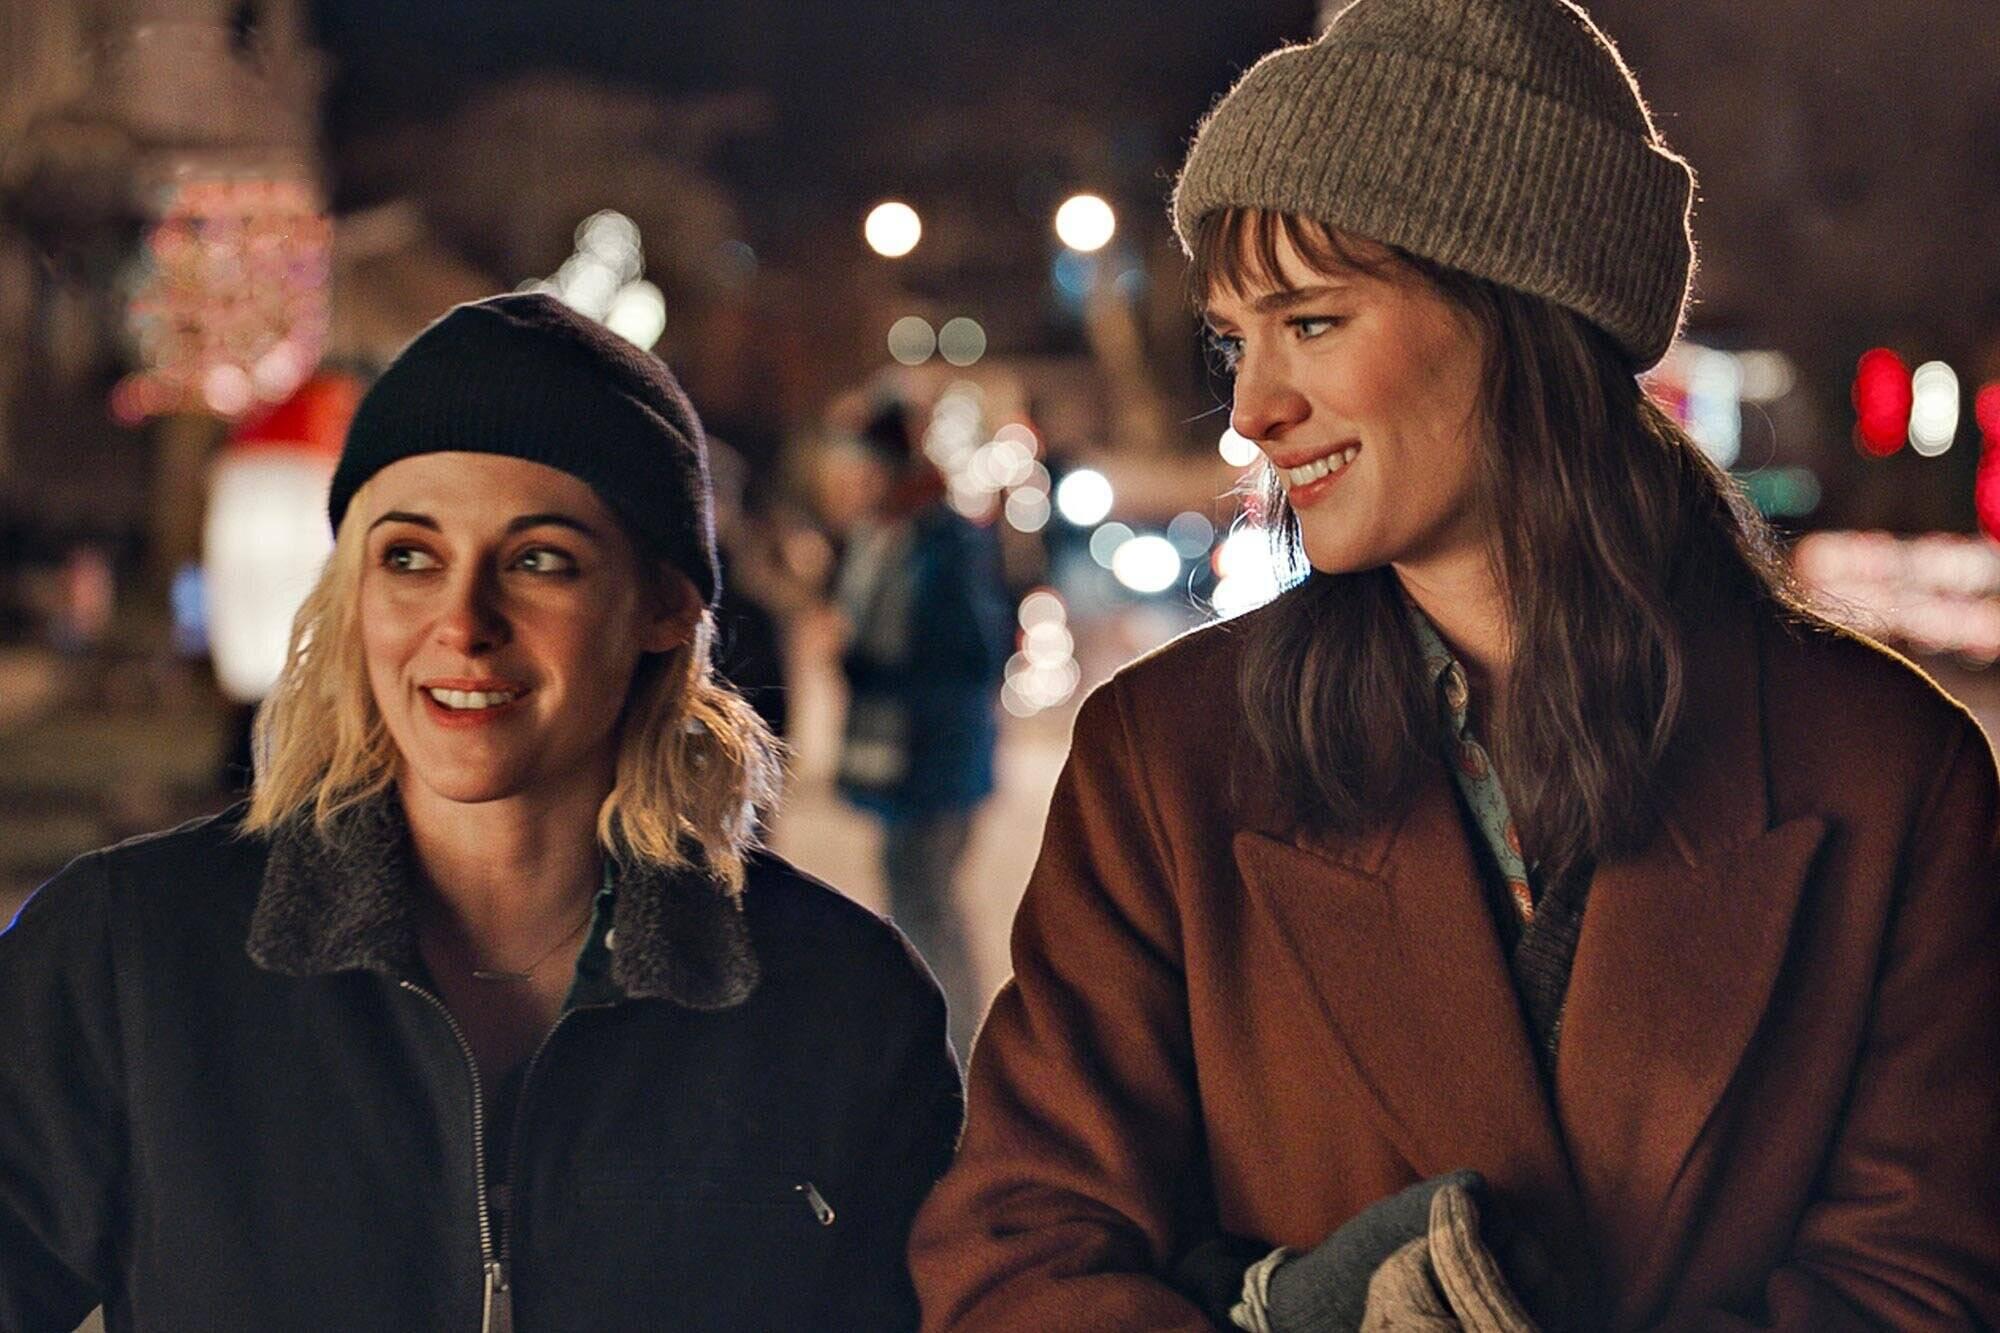 HAPPIEST SEASON film review